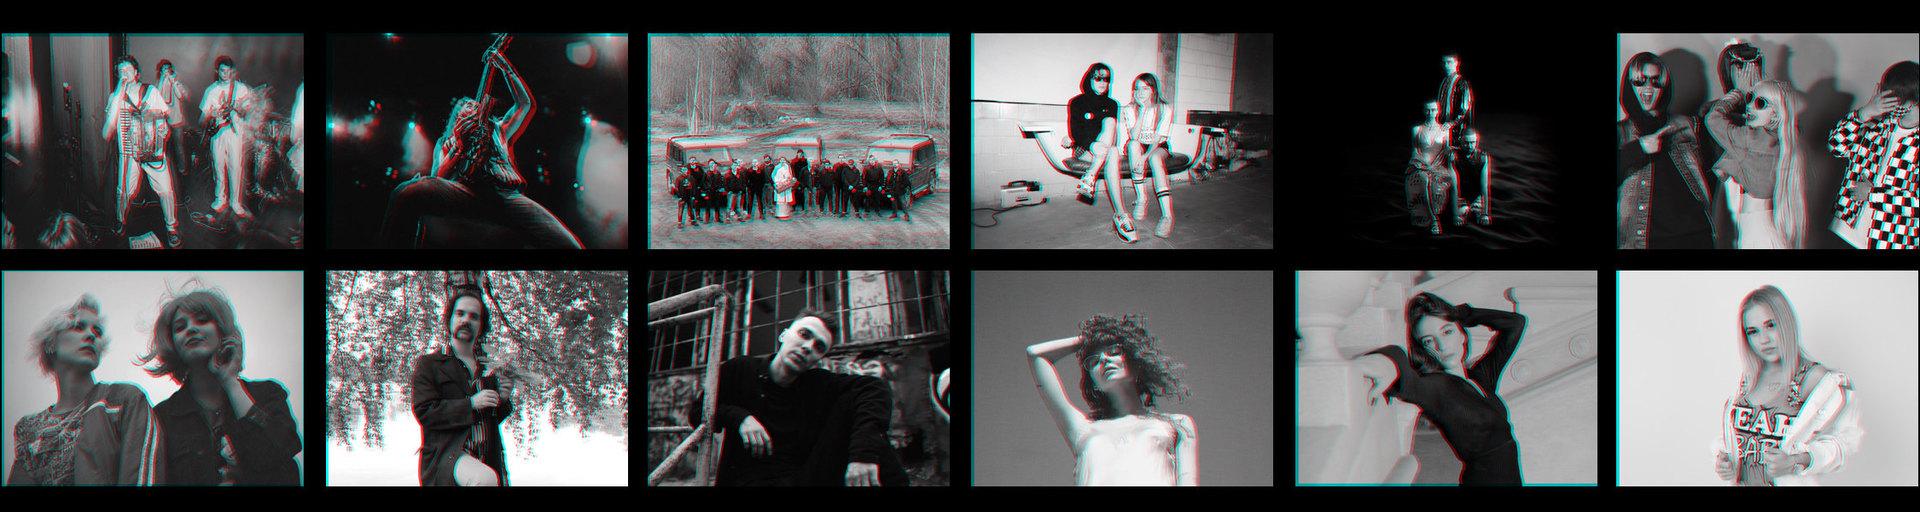 Они придут насмену Гречке иМонеточке: новая музыка изВКонтакте